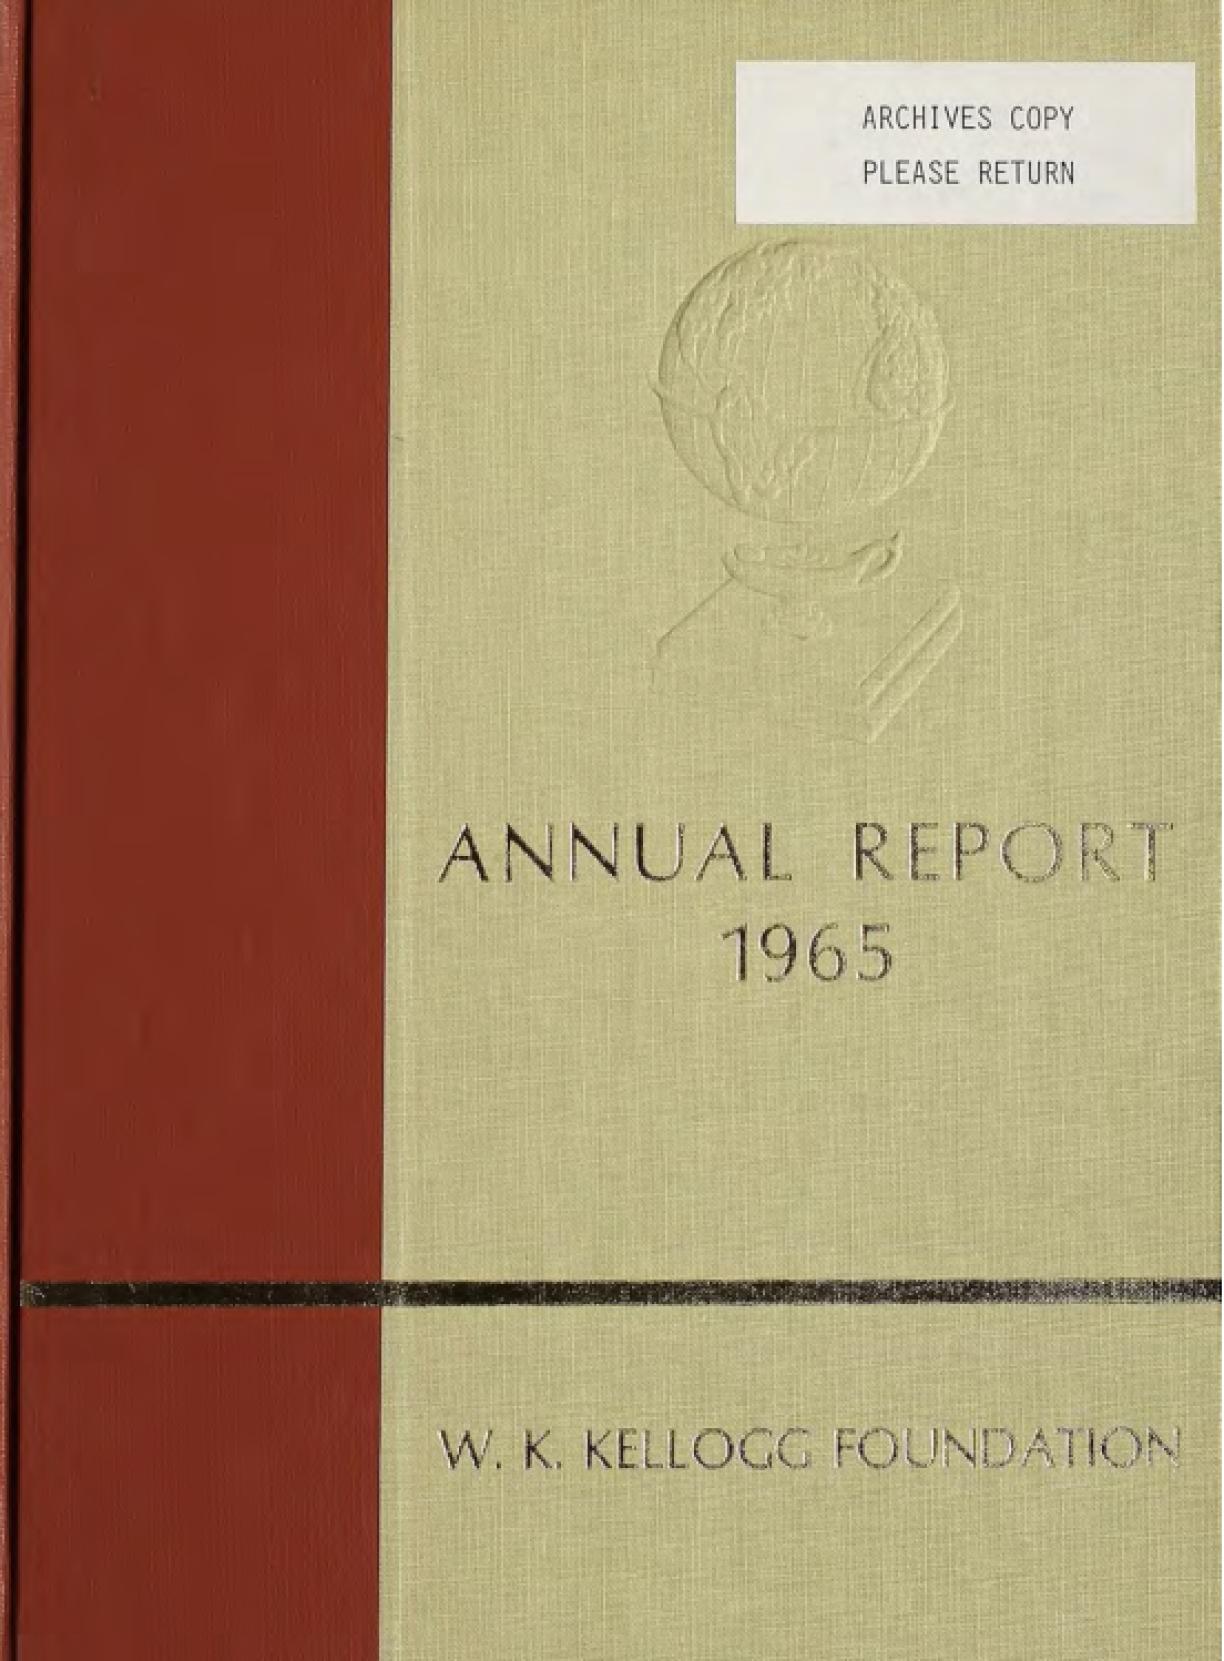 1965 W.K. Kellogg Foundation Annual Report